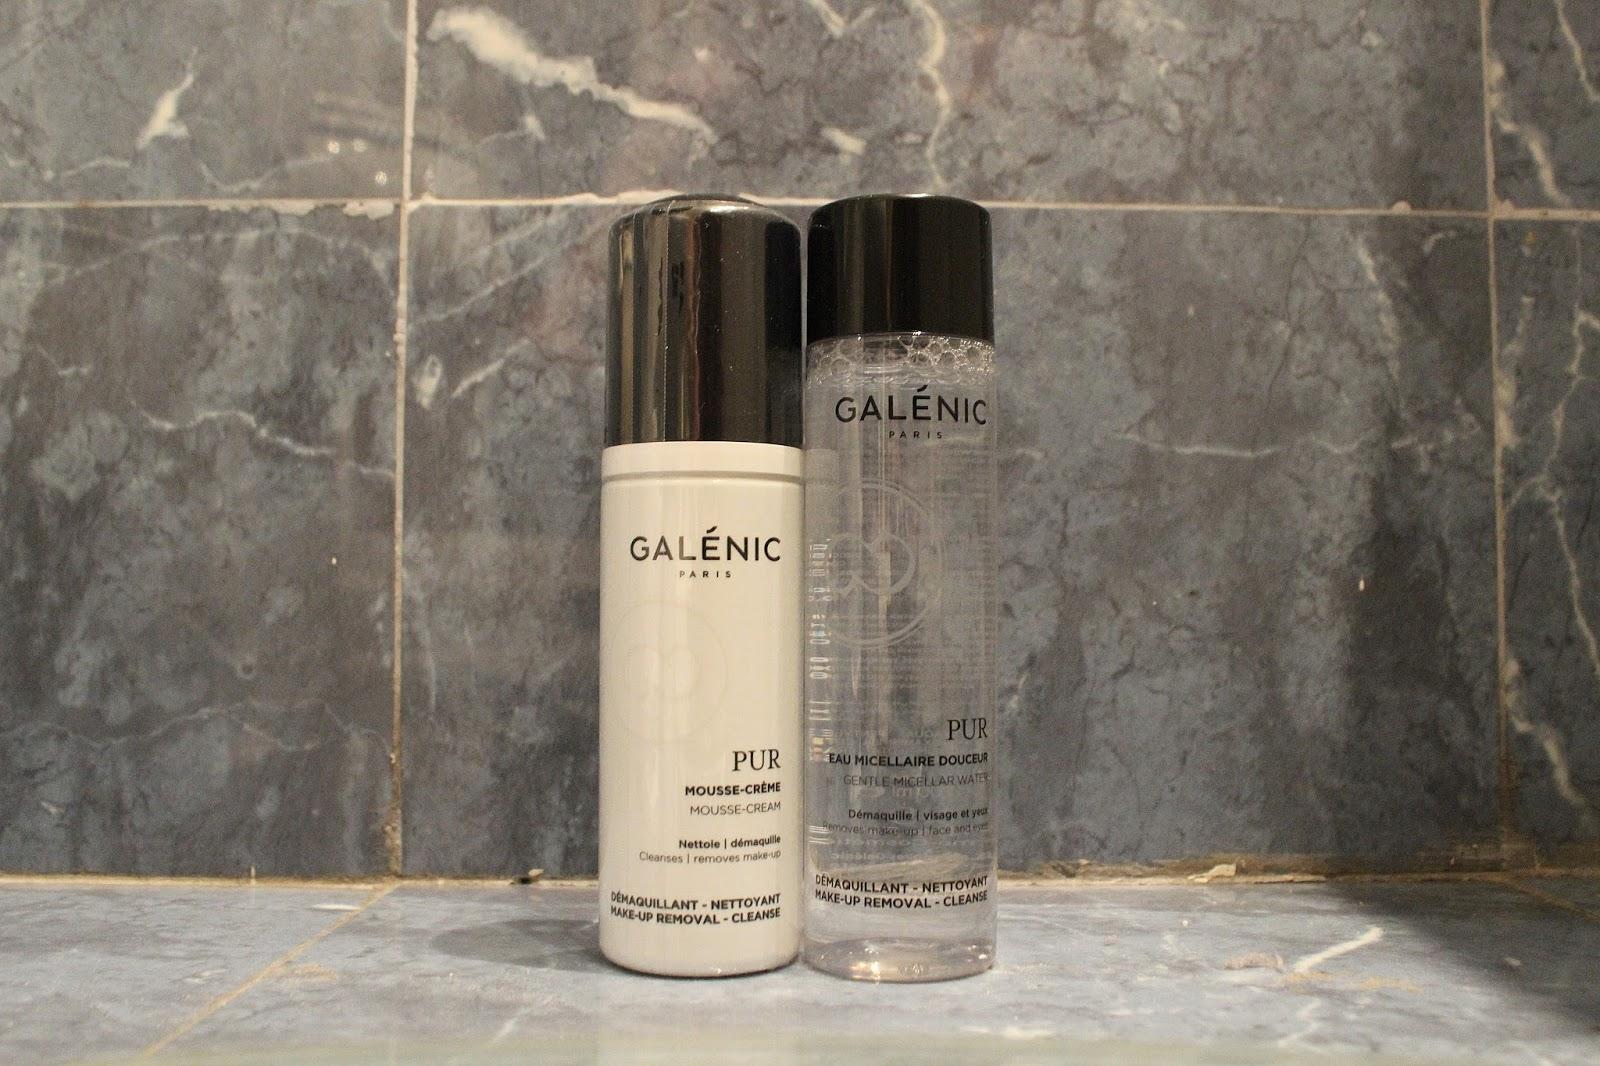 agua micelar galenic pierre fabre